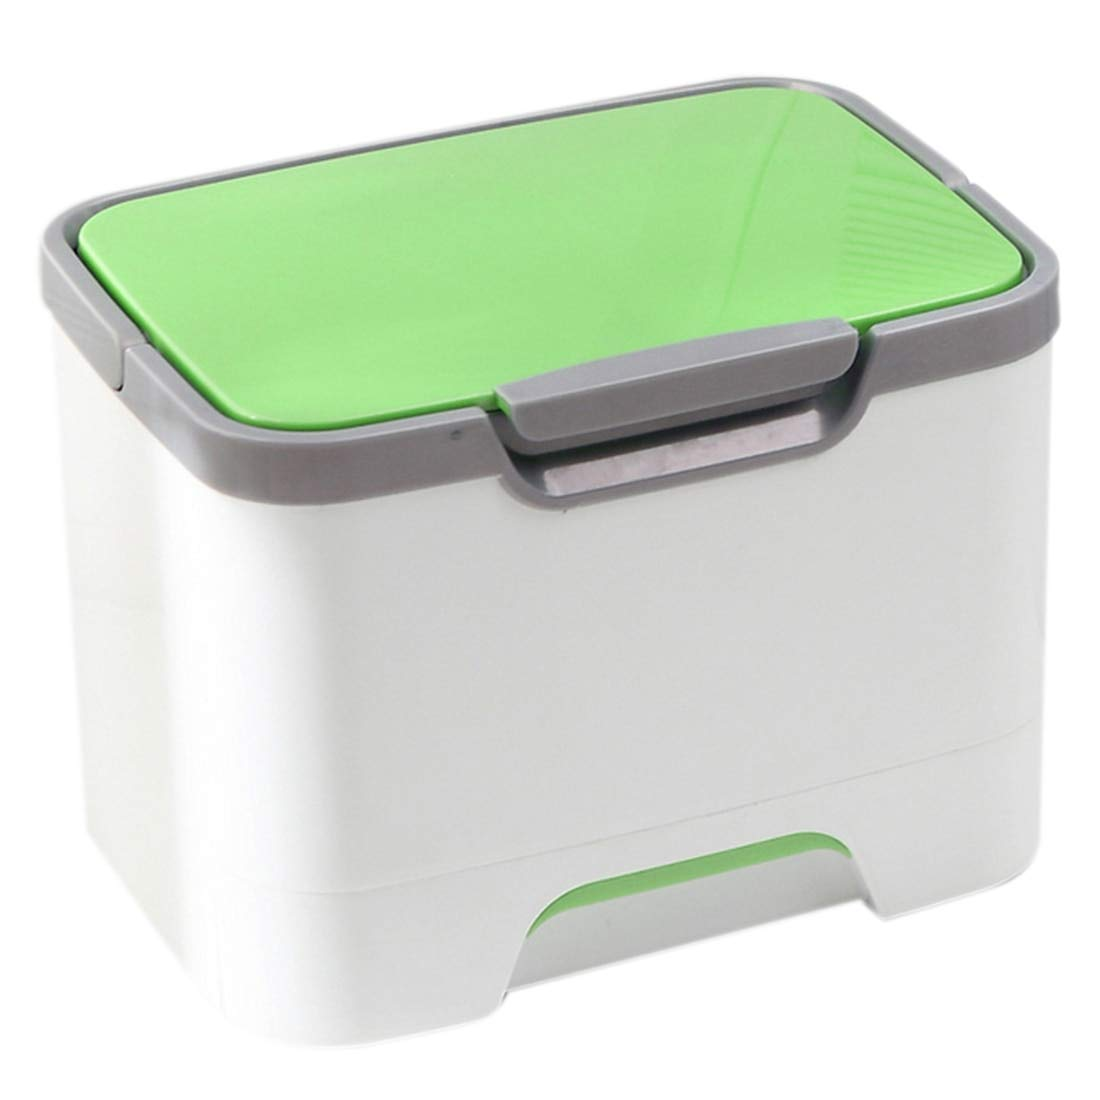 VT BigHome Household Multi-Grid First Aid Kit Storage Box Multifunction Medicine Storage Box Organizer Drug Pill Box Case by VT BigHome (Image #1)